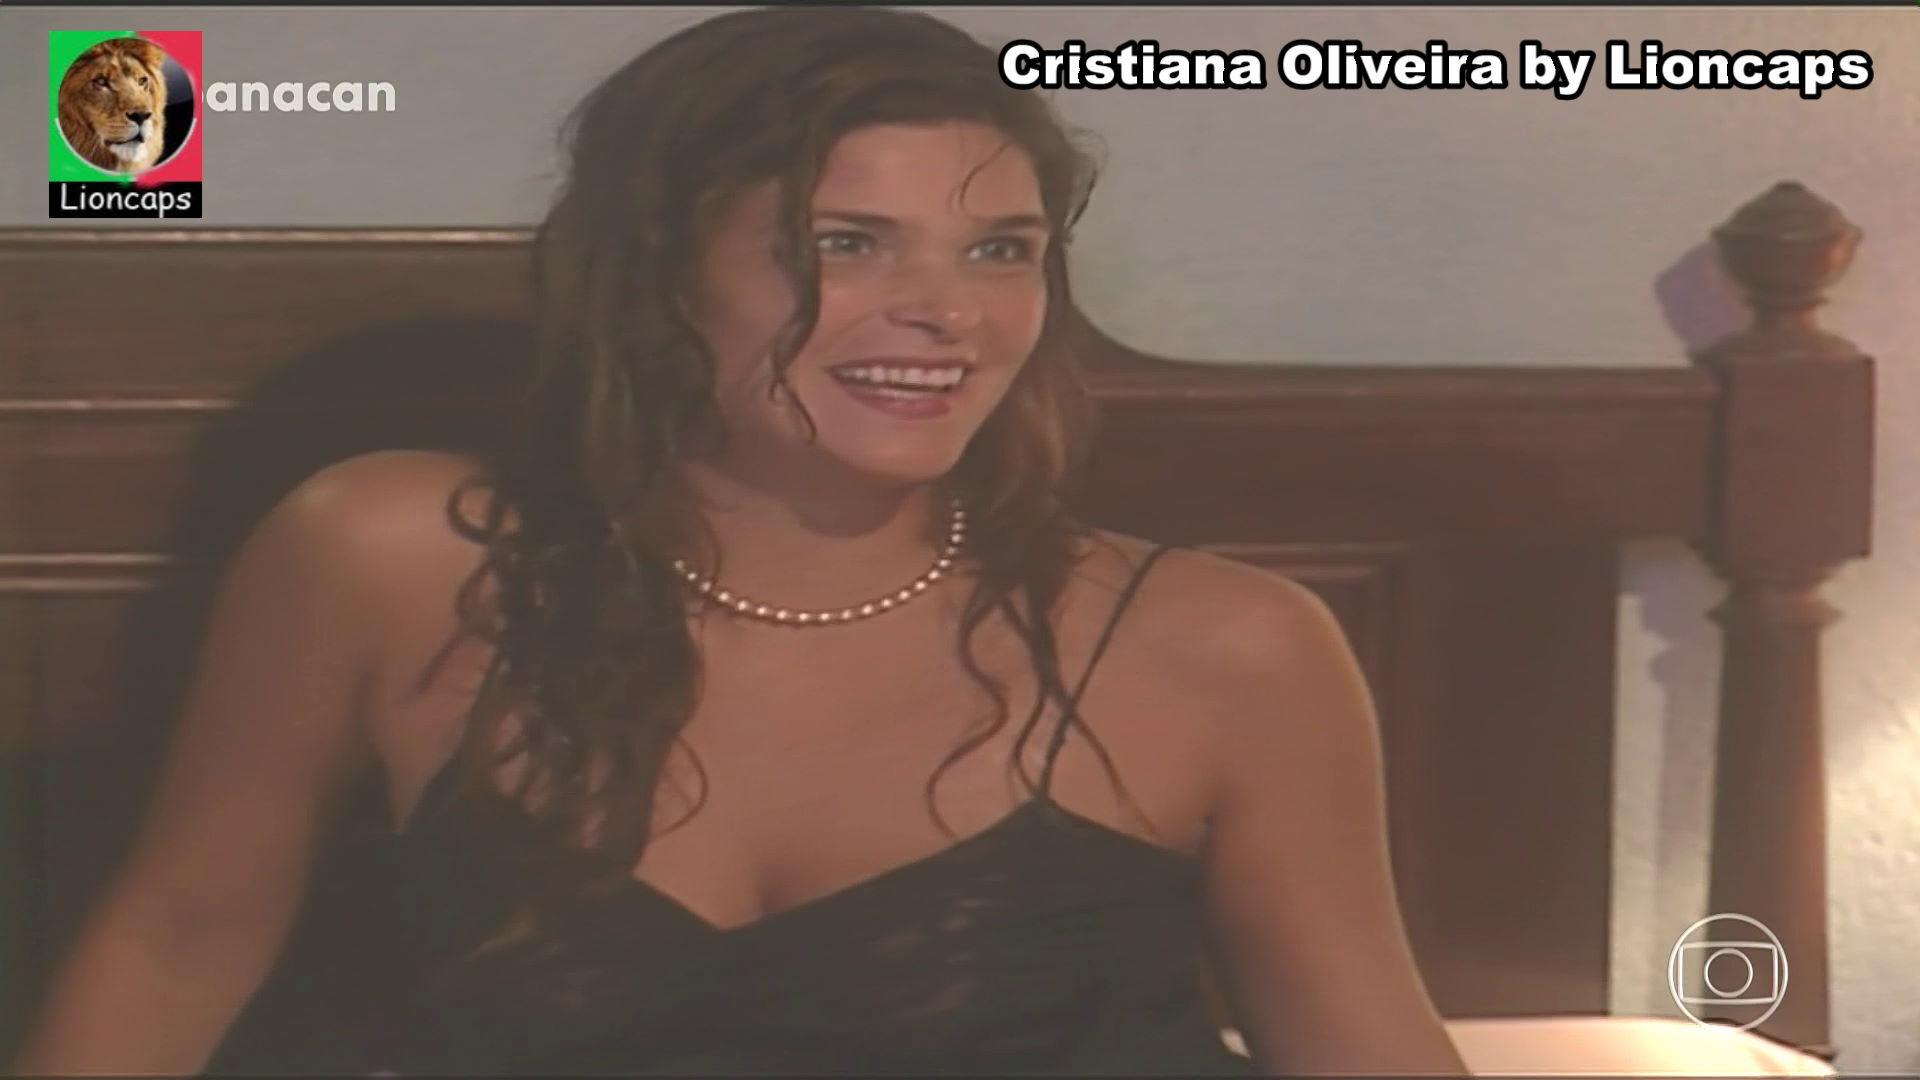 cristiana_oliveira_vs200604-088 (15).JPG